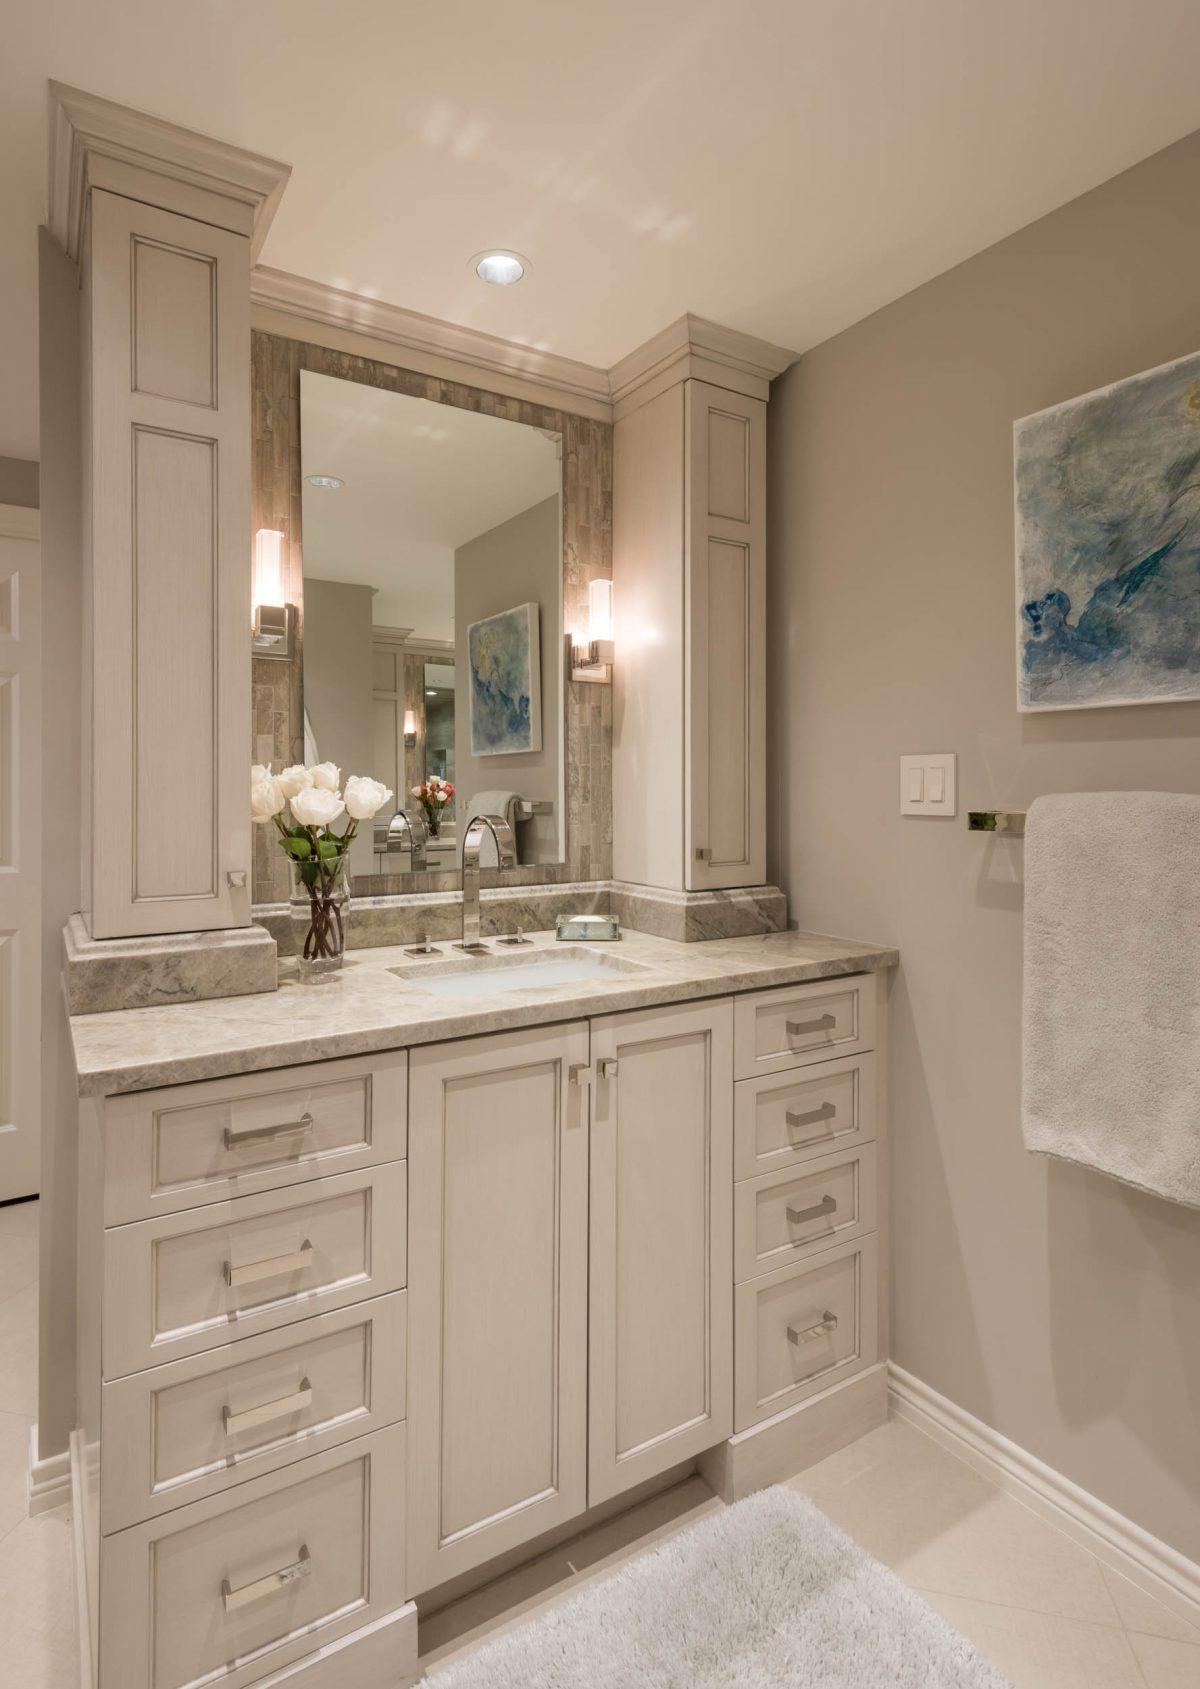 University Park Interior Design (With images) | Bathroom ...